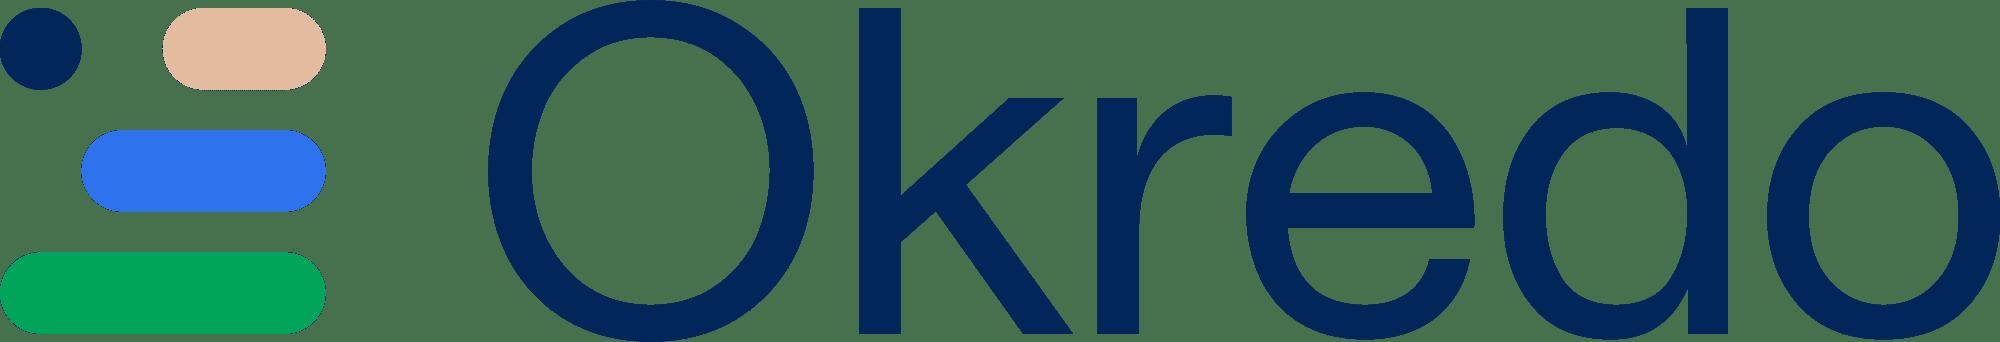 Okredo_logo